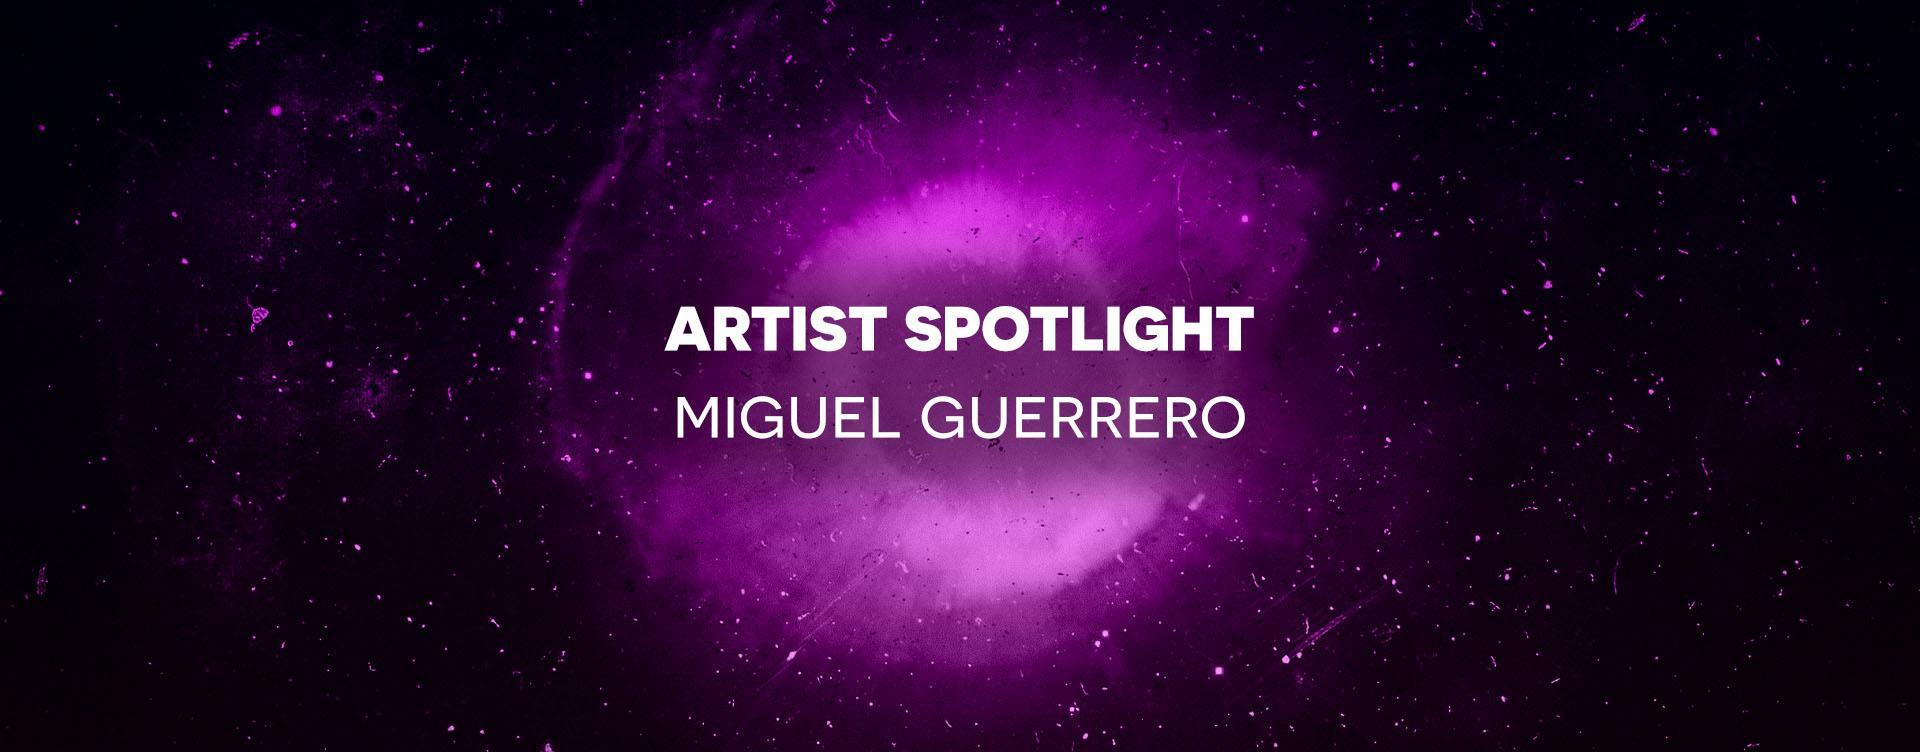 Miguel Guerrero artist spotlight